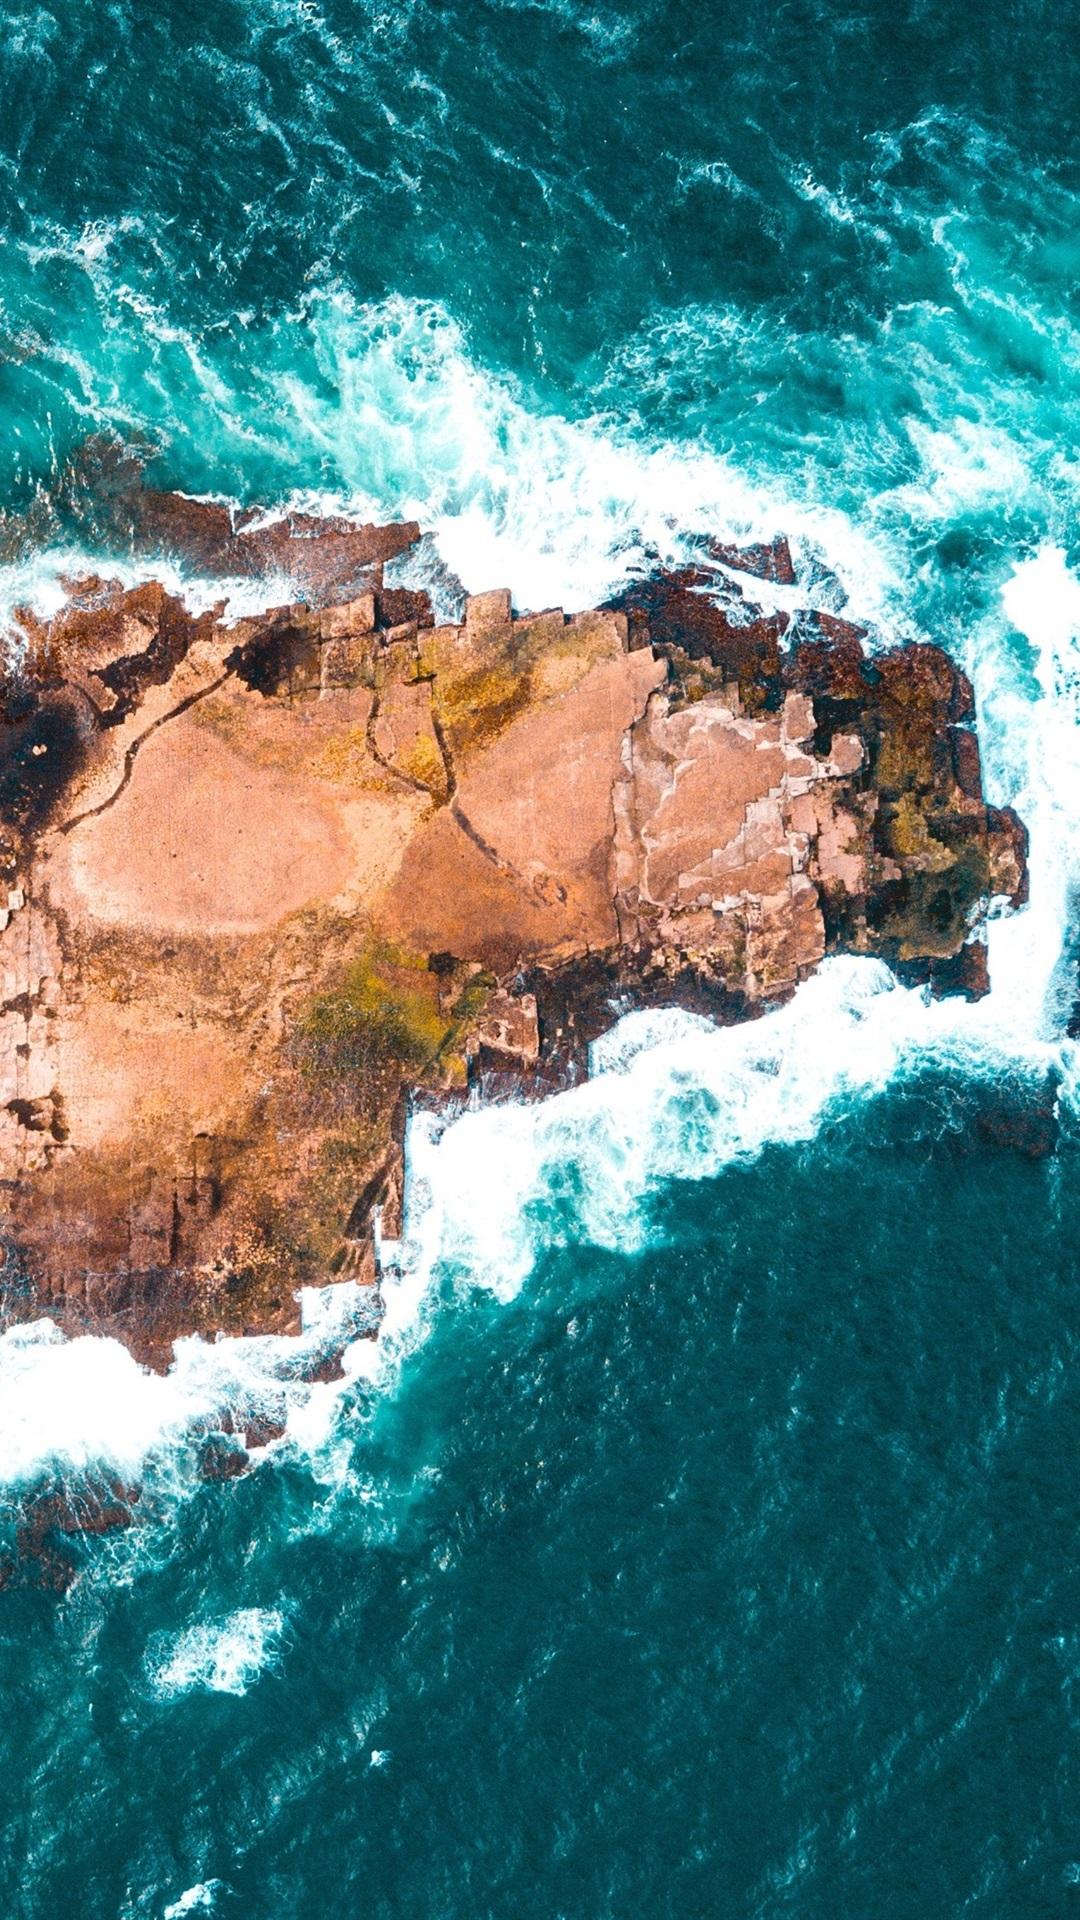 Stone Island Top View Sea Waves 1080x1920 Iphone 8766s